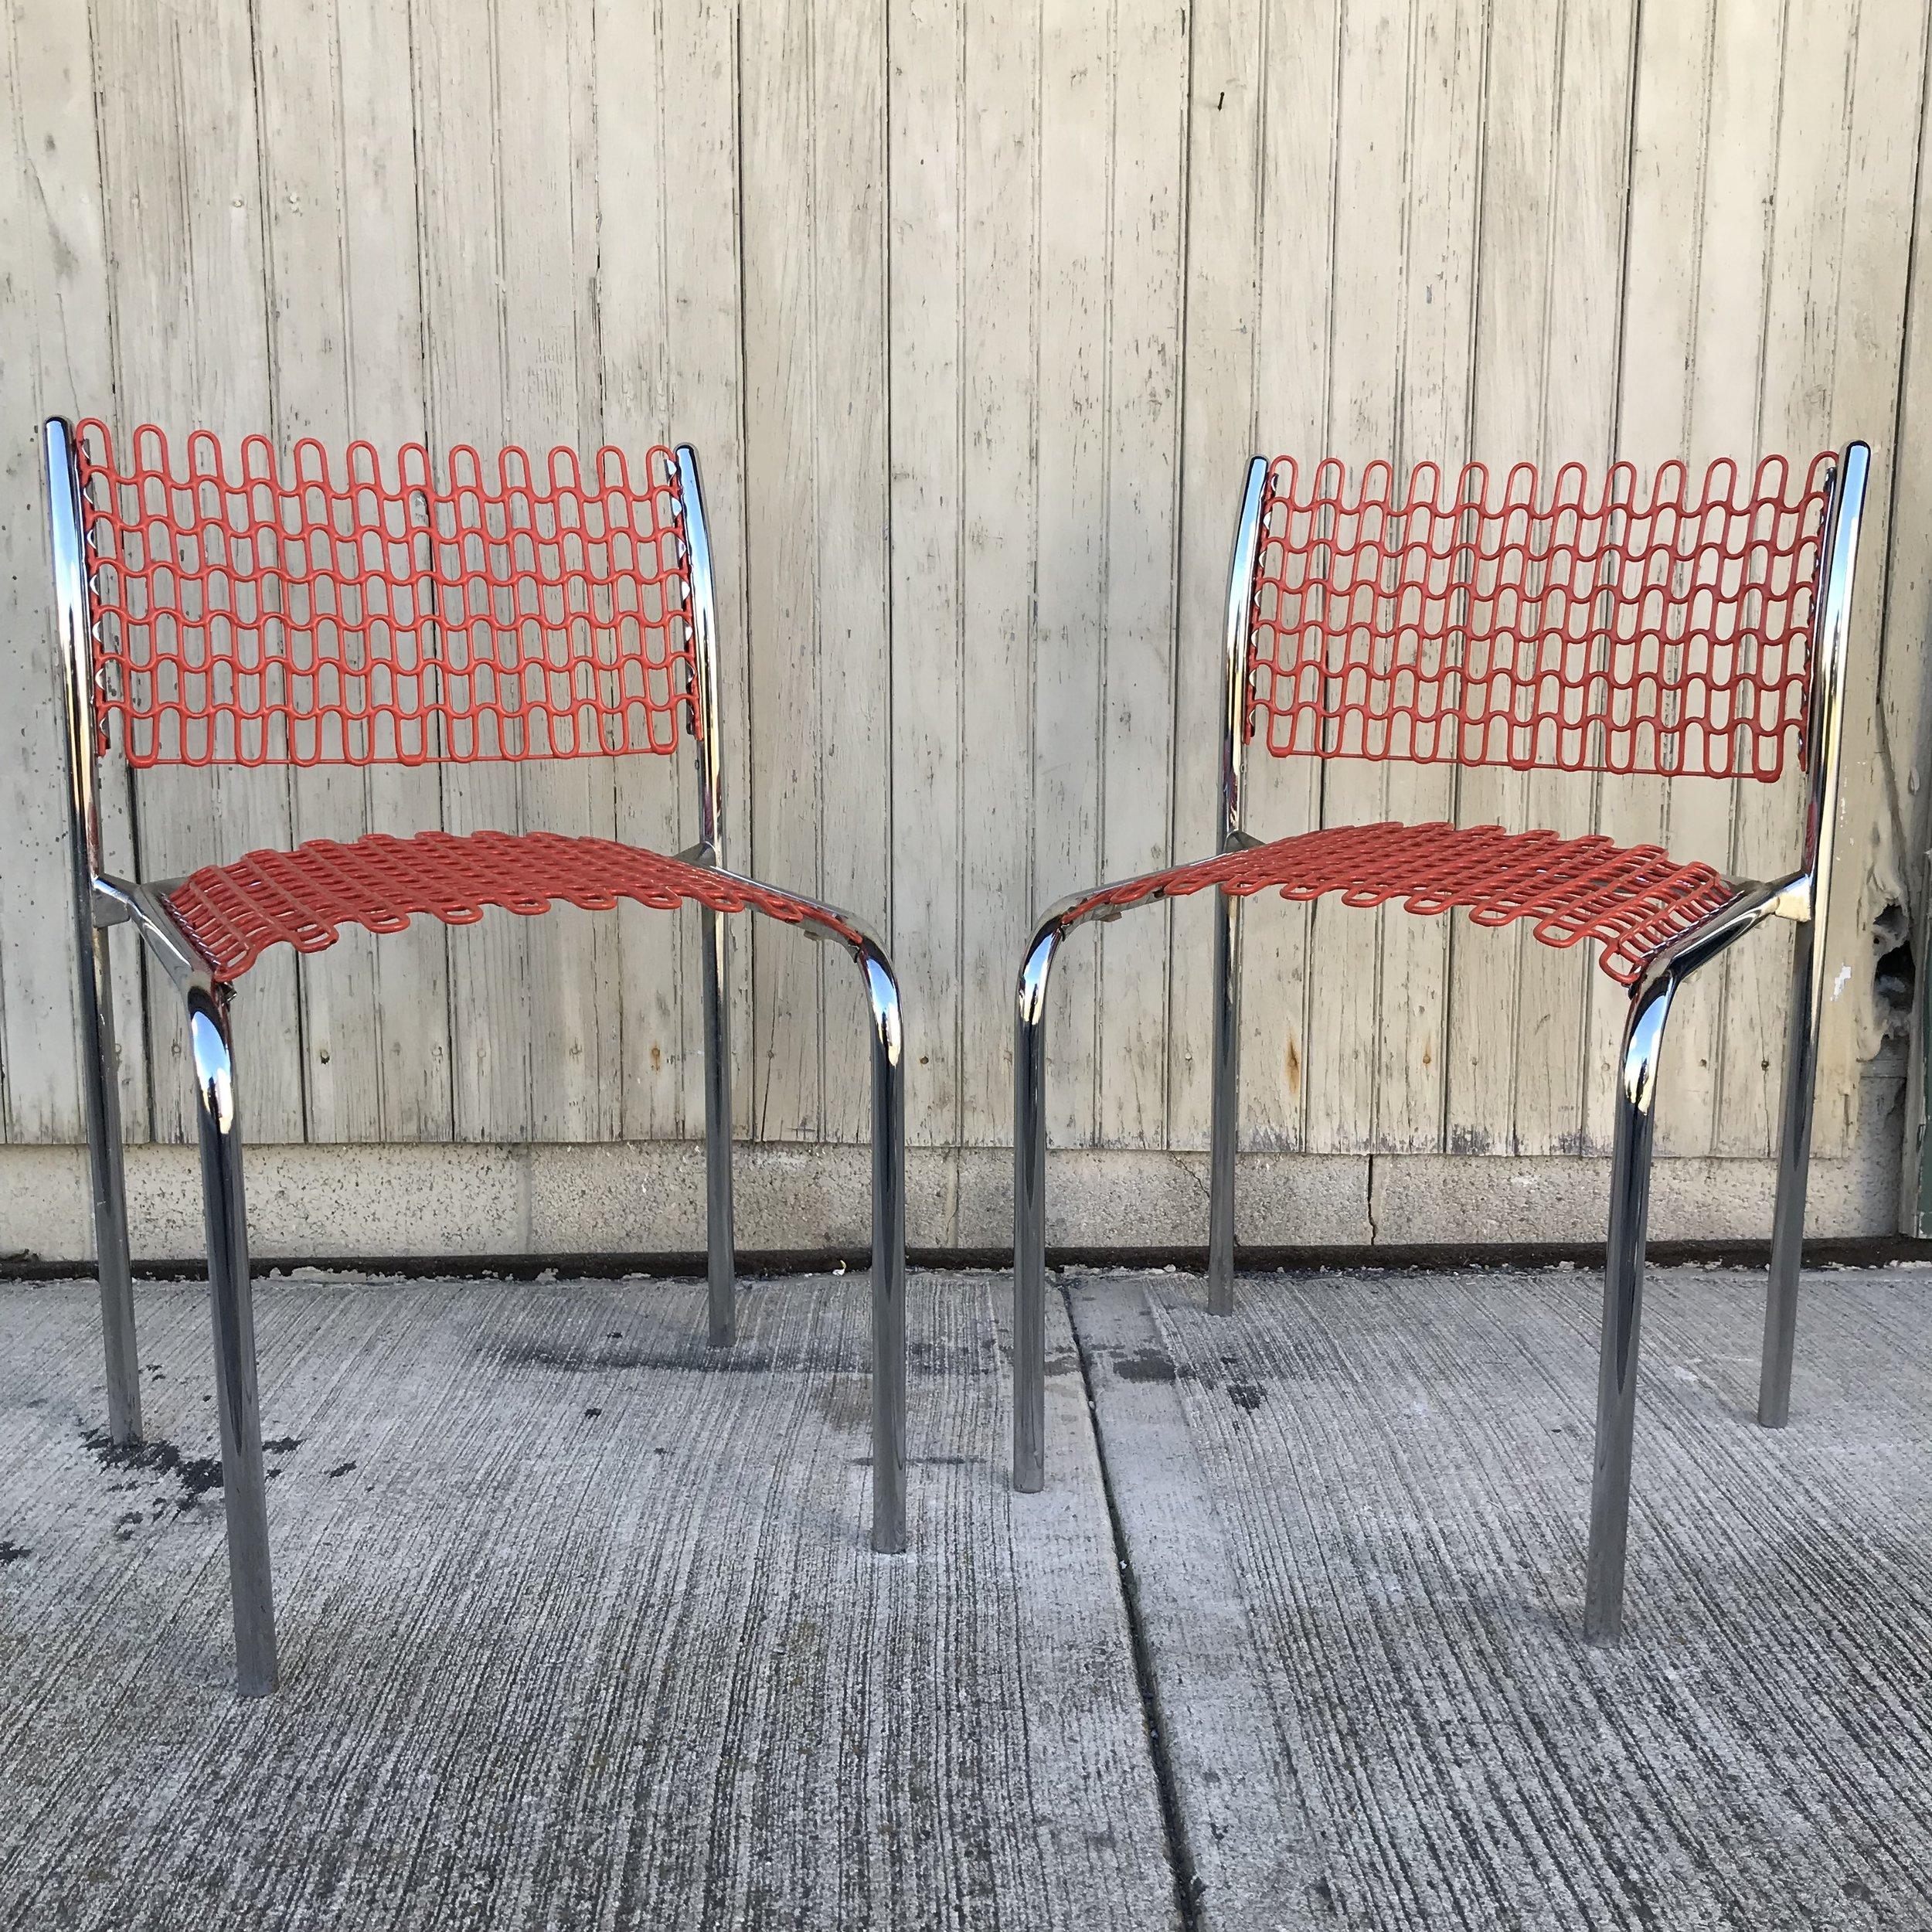 david rowland metal chair armchair tray table pair sof tech chairs repop img 0414 jpg